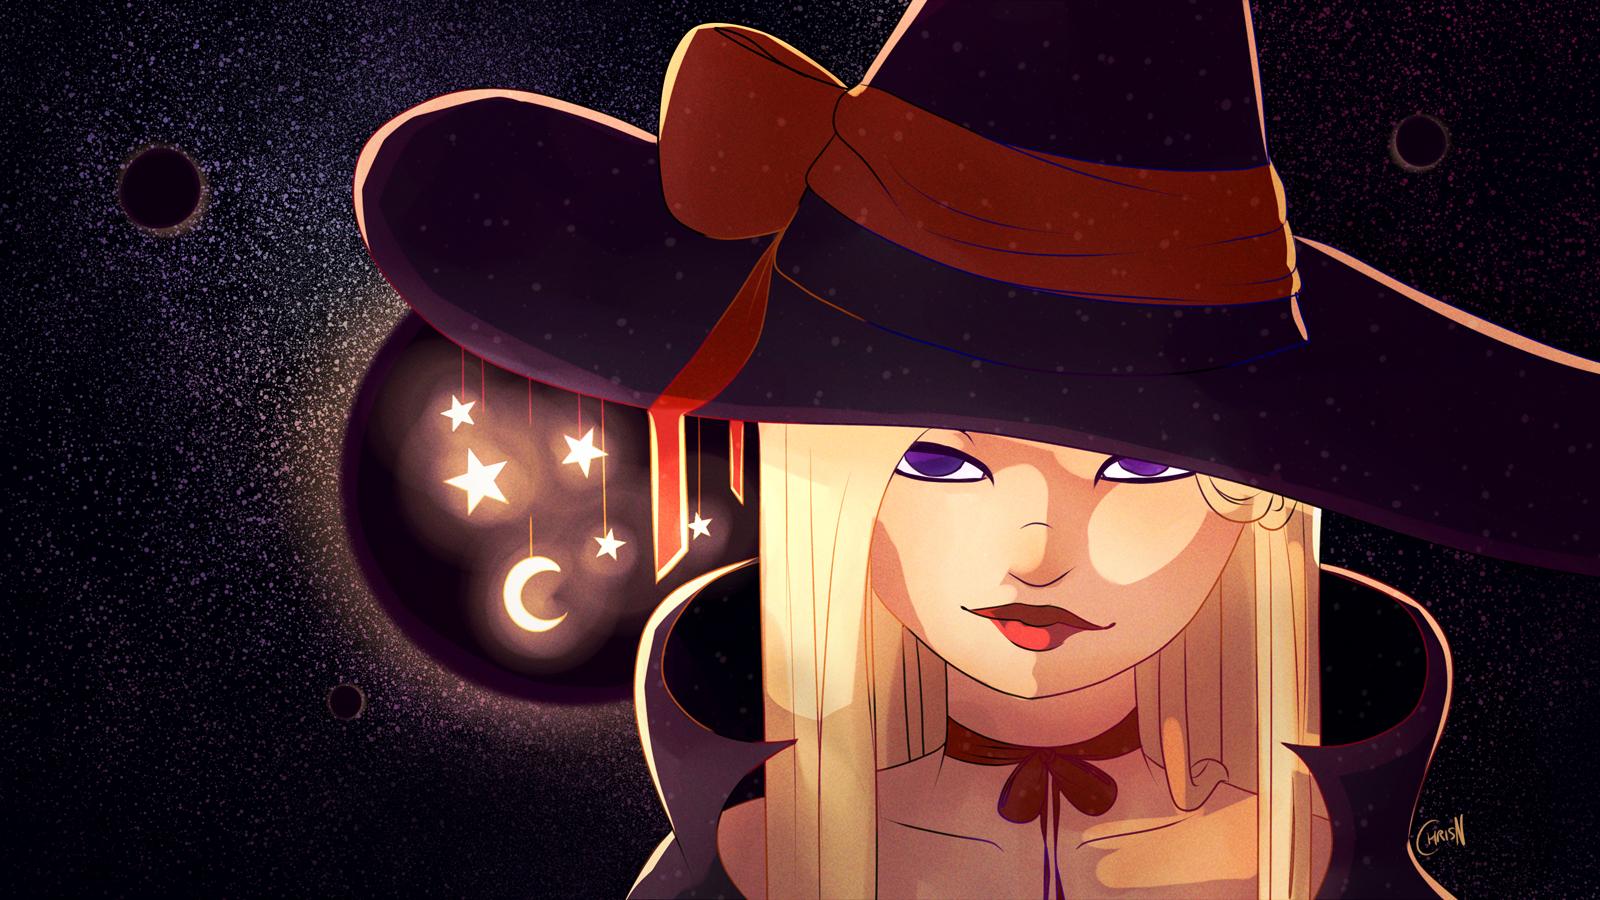 Galaxy Witch